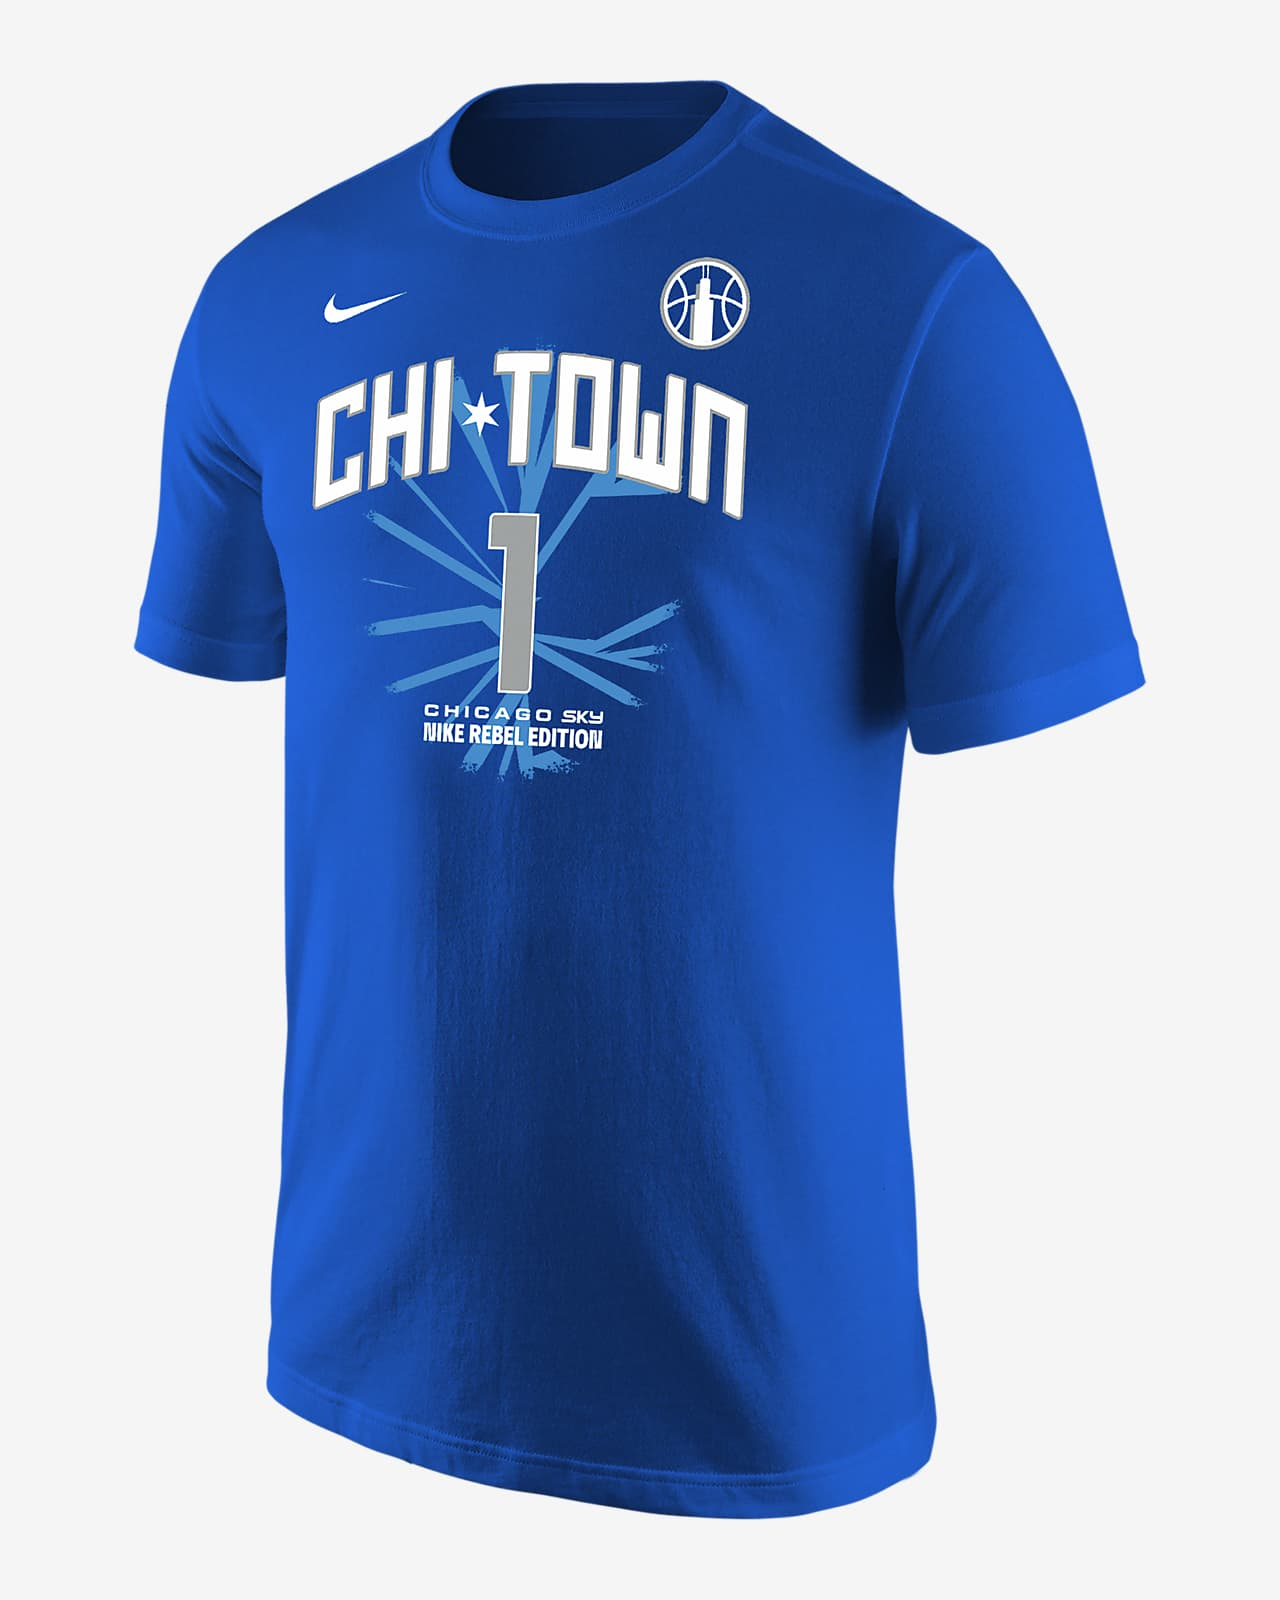 Diamond DeShields Sky Rebel Edition Nike WNBA T-Shirt